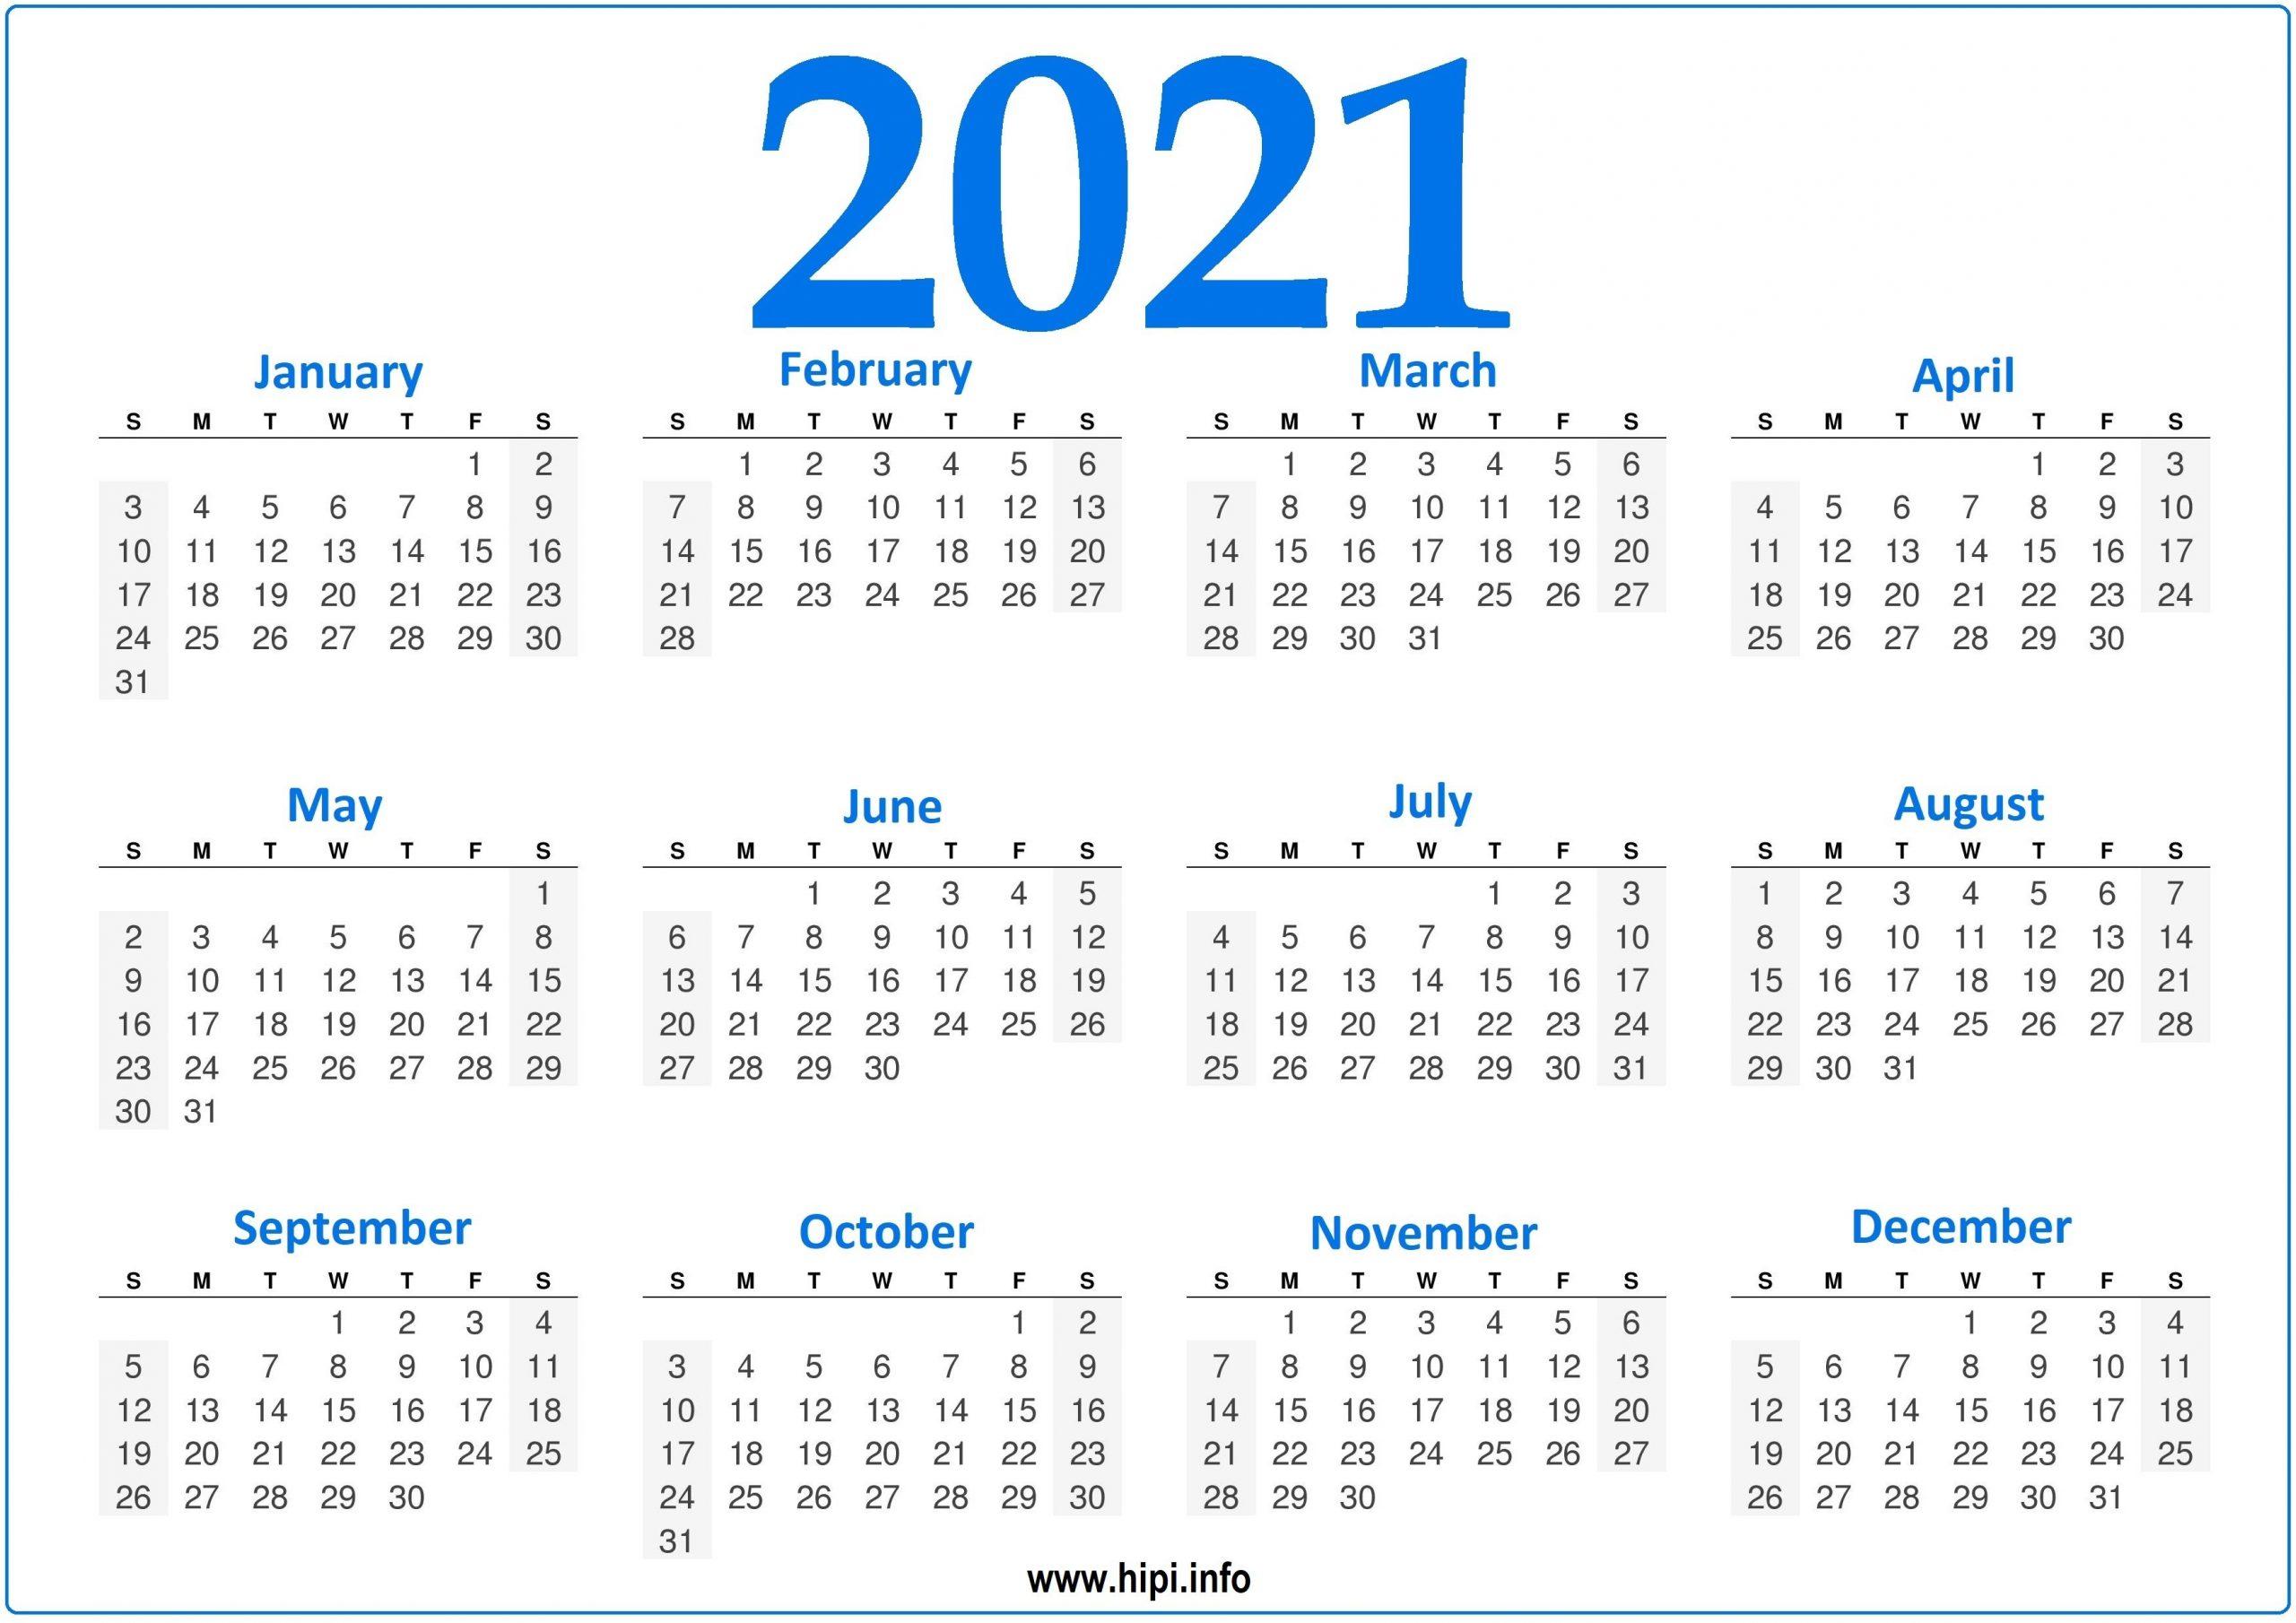 2021 Calendar Editable Free - Free Fully Editable 2021 Calendar Template In Word : Download And regarding Printable Calendars For 2021 Graphics